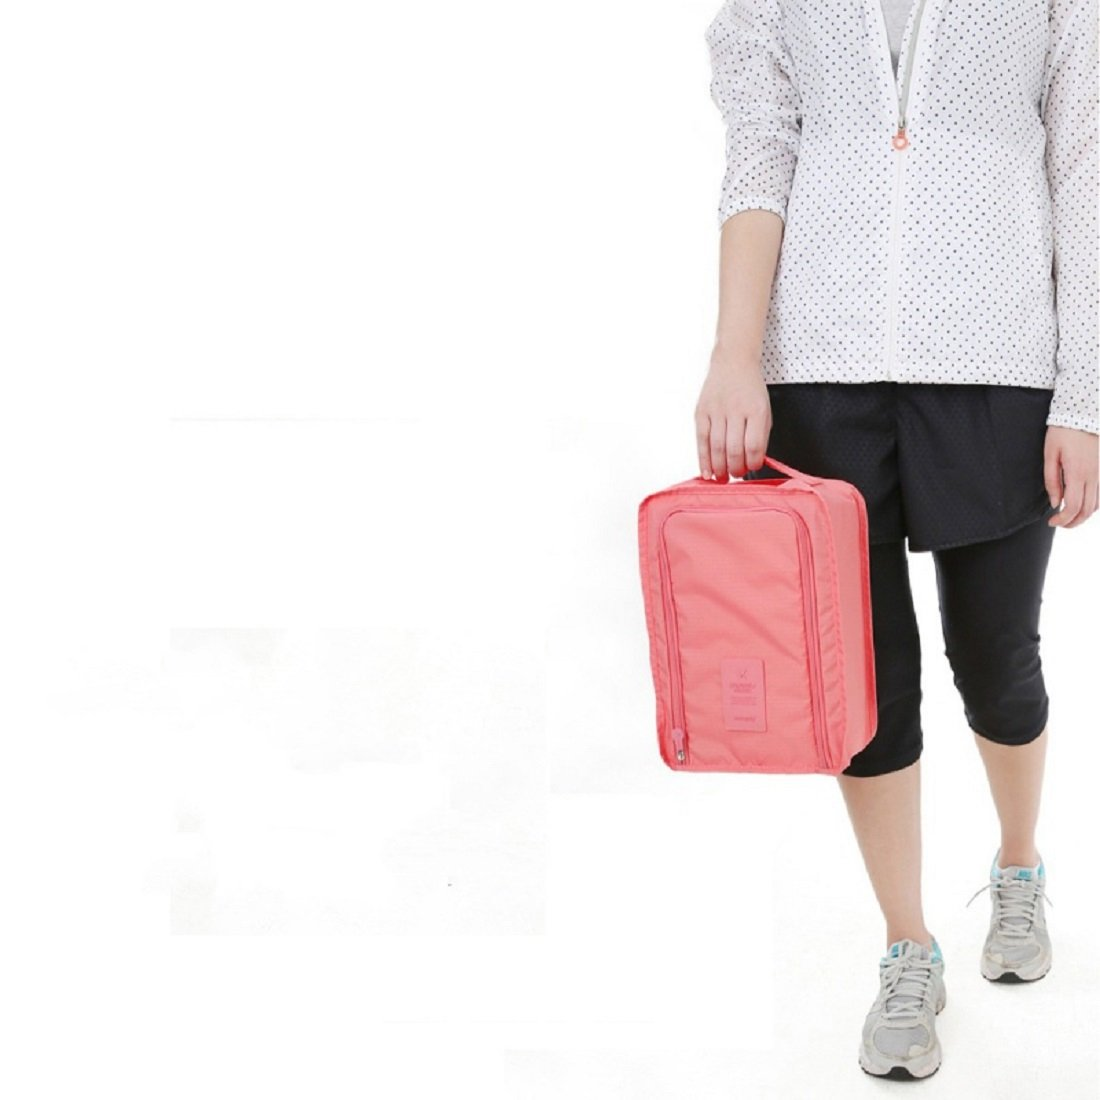 24c738beac7d Waterproof Shoe Travel Pouch Portable Tote Organizer Storage Bag ...